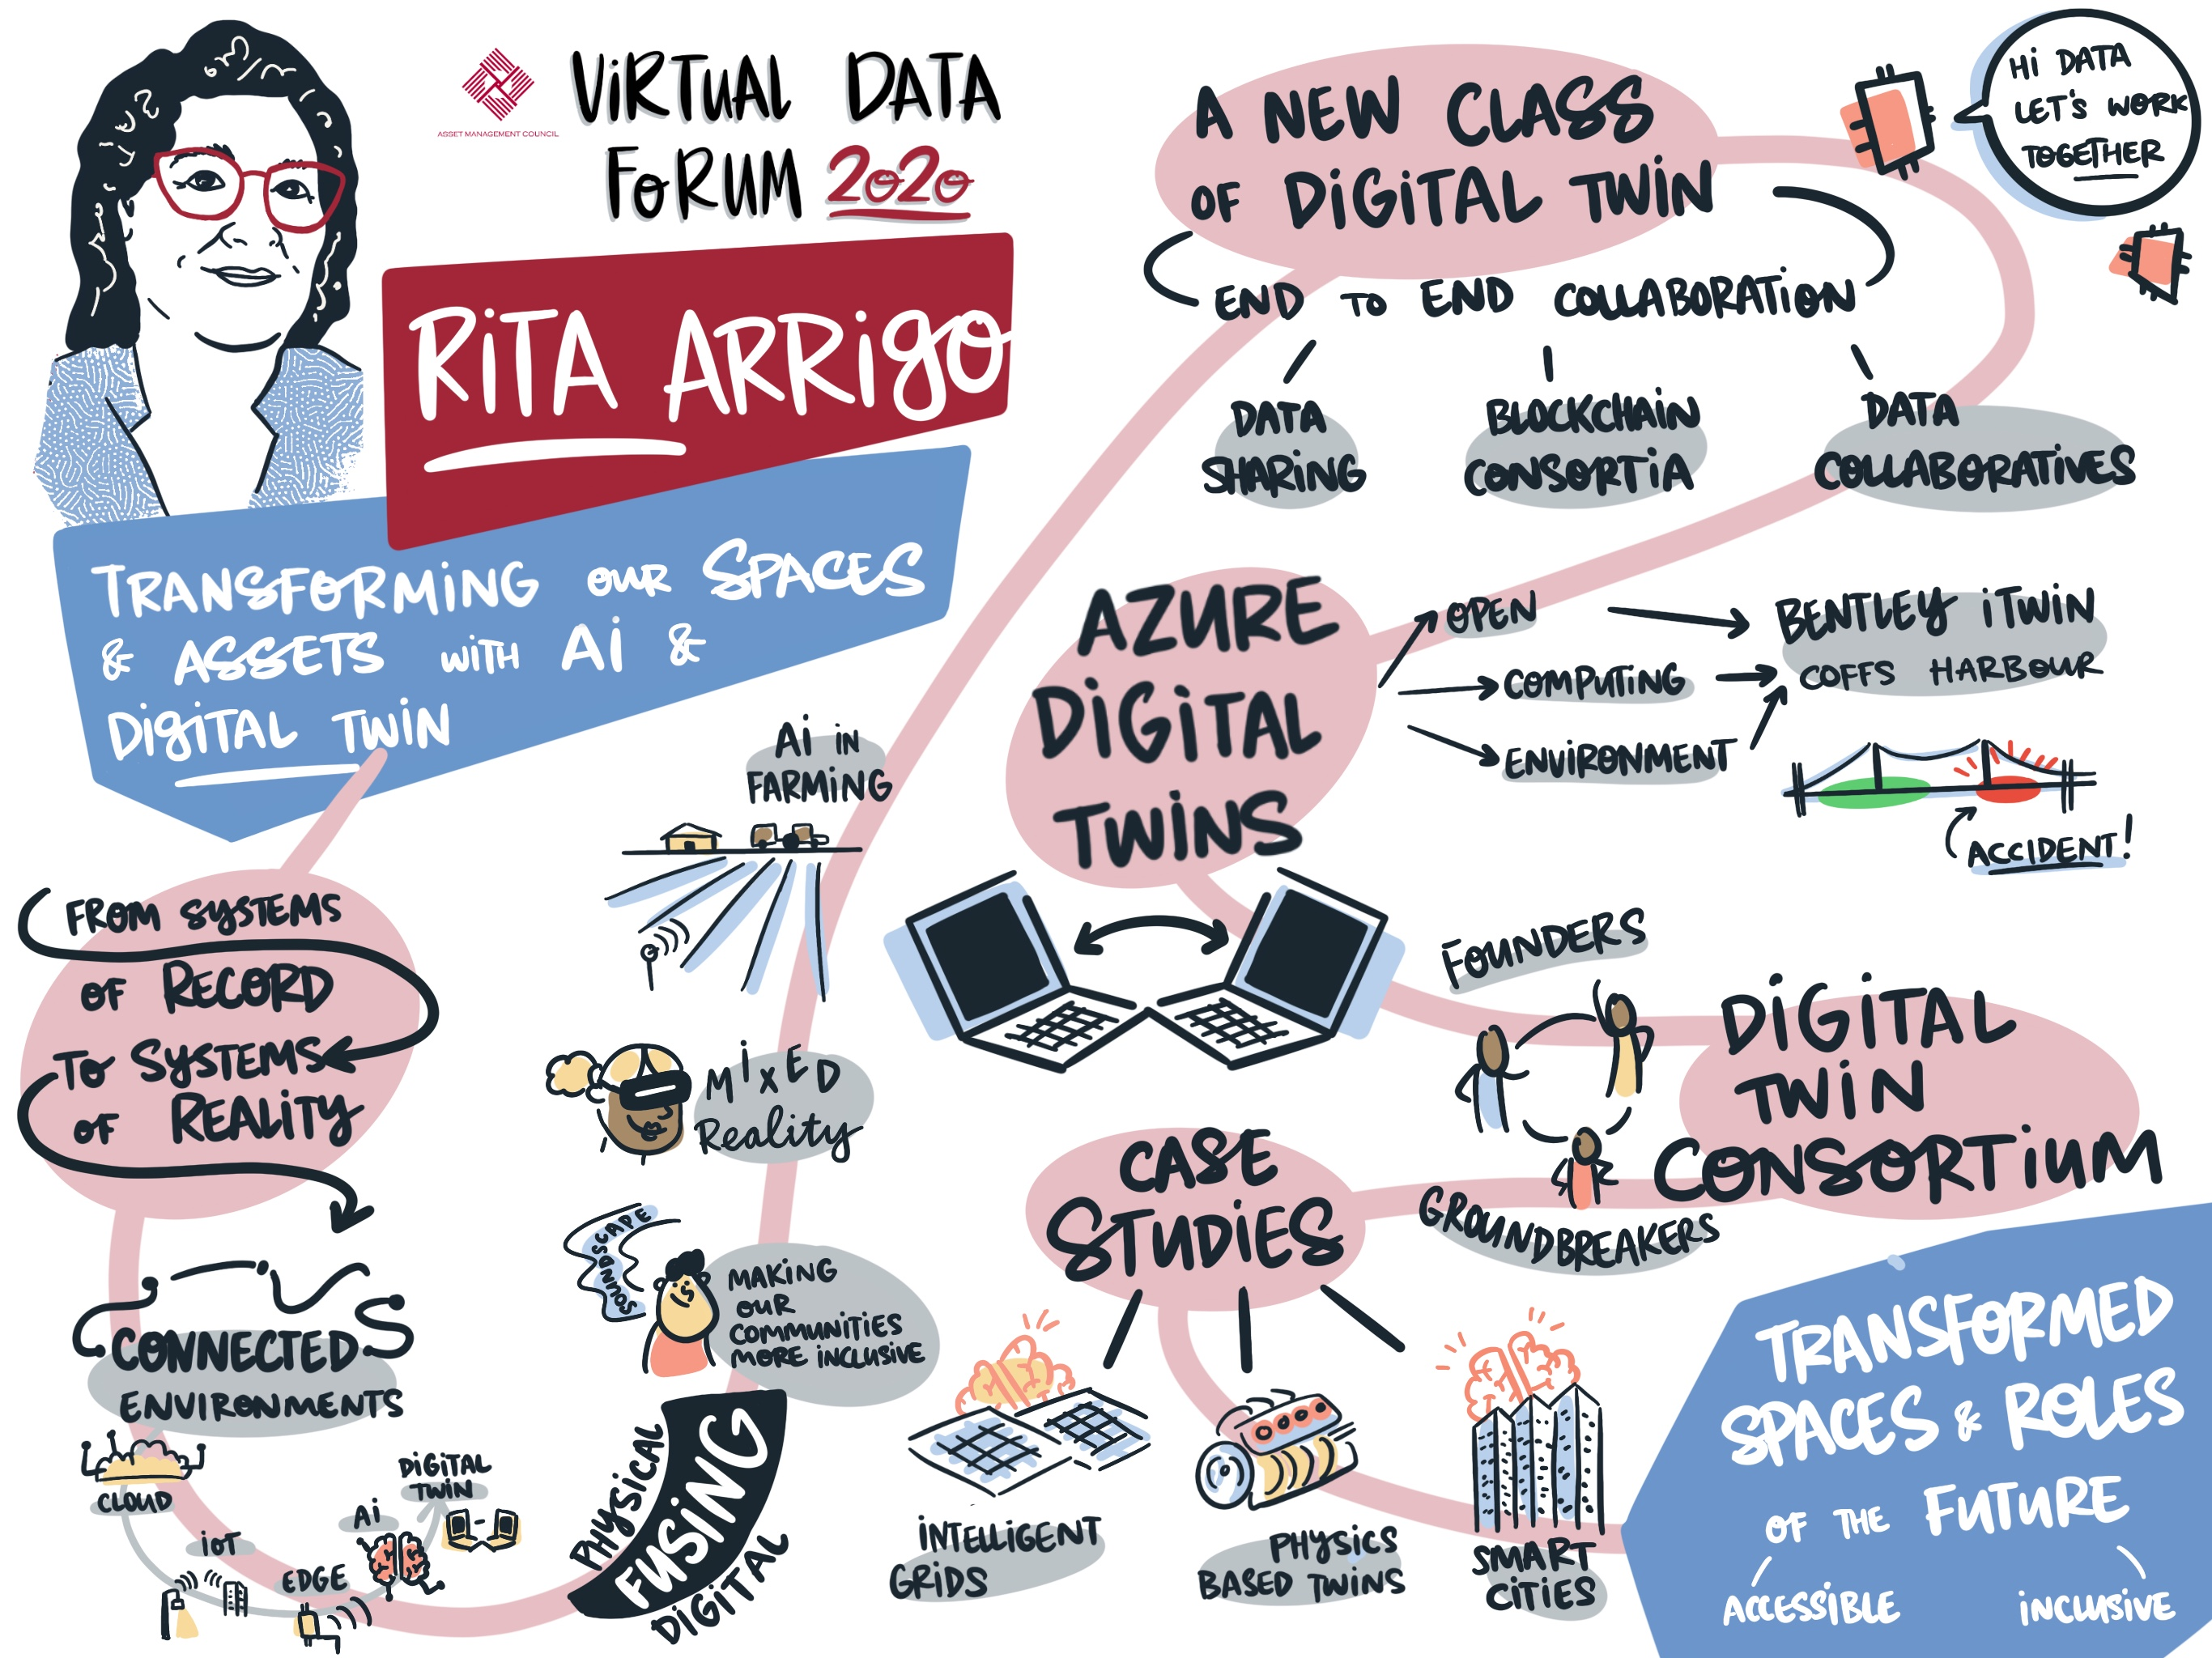 Rita Arrigo, Microsoft